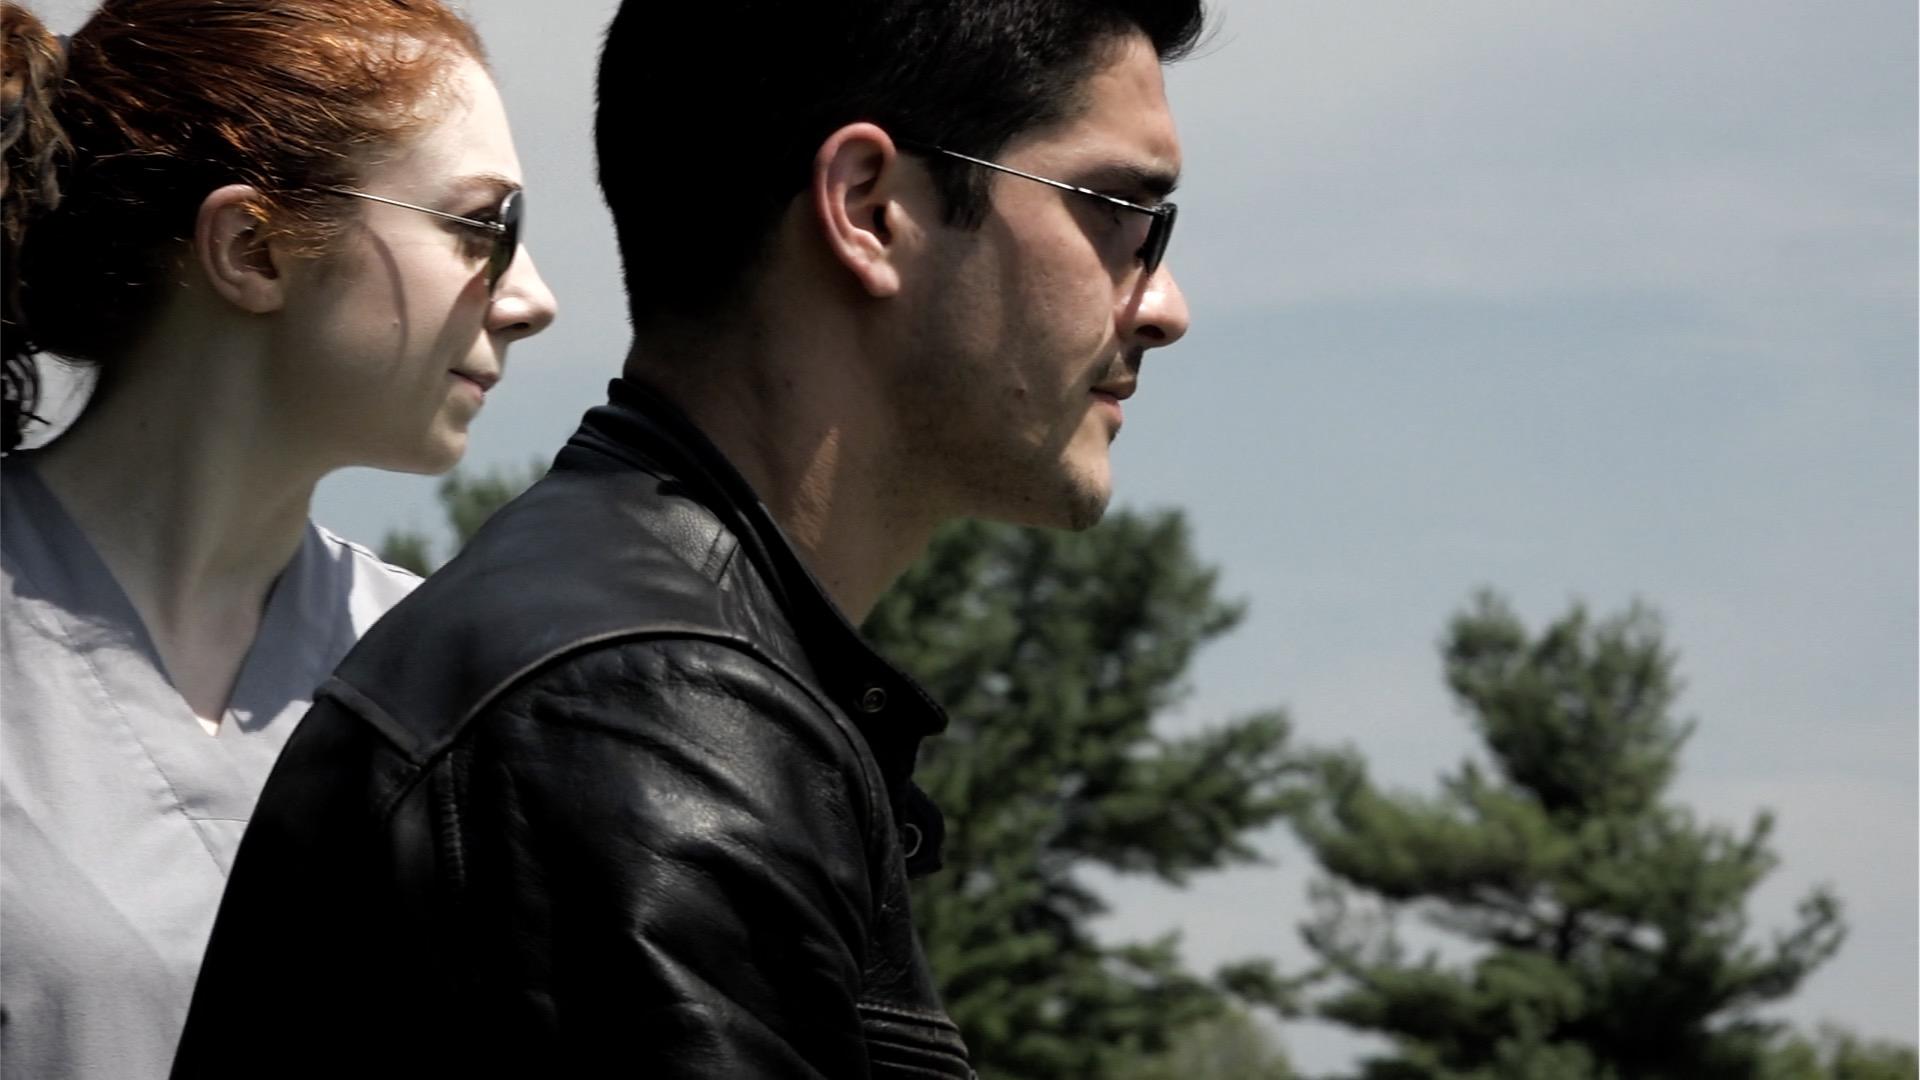 Corinne Britti & Dante Savion